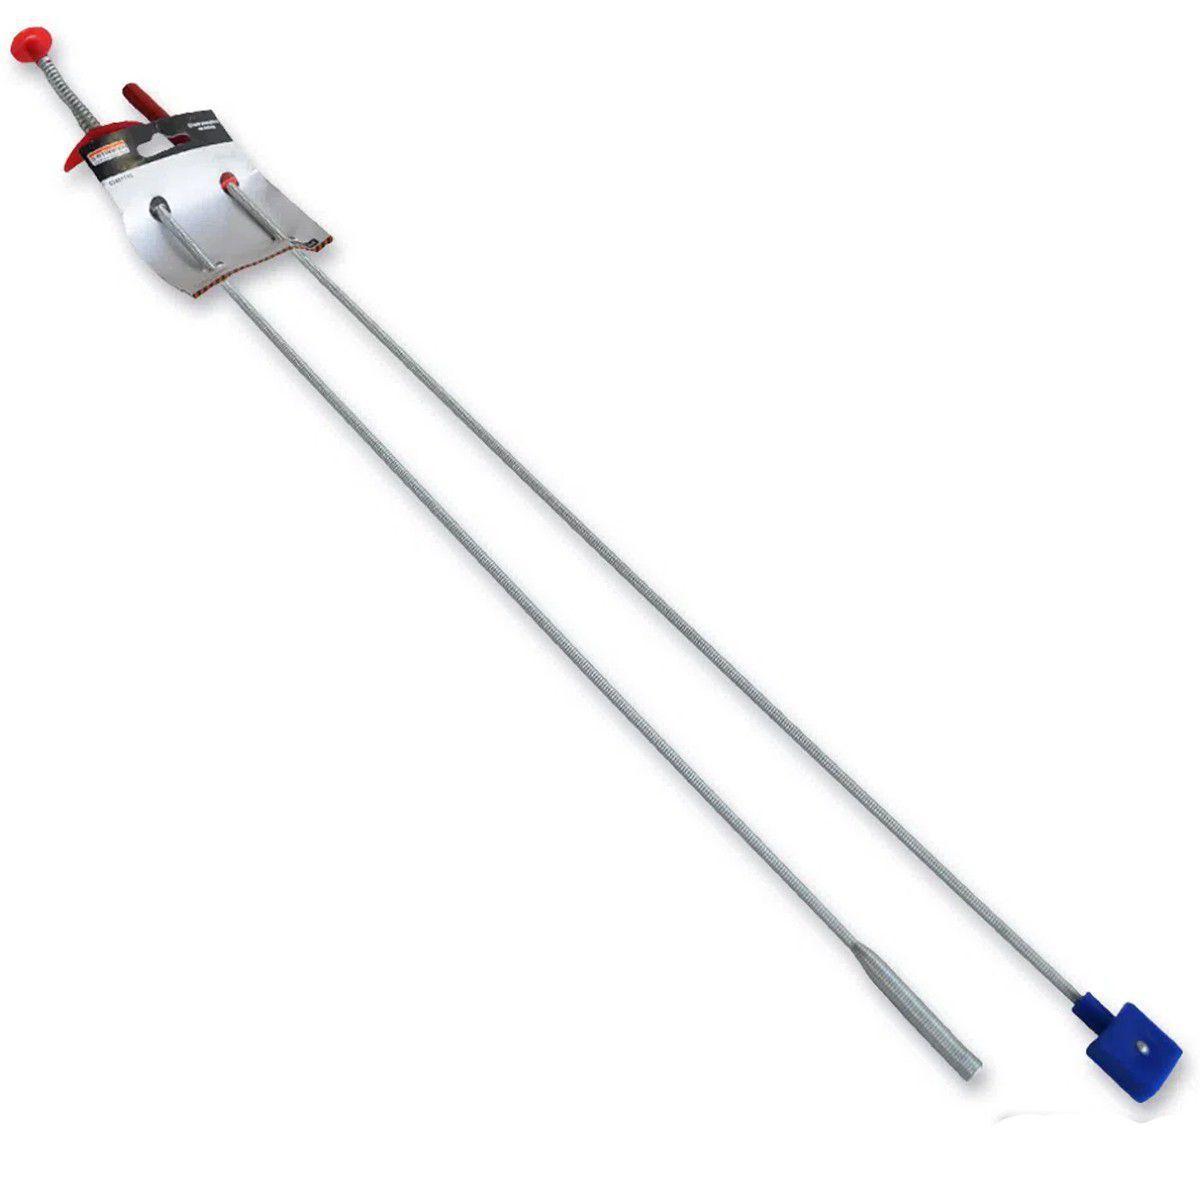 Chave Pescadora de Metais 03481700 - Starfer